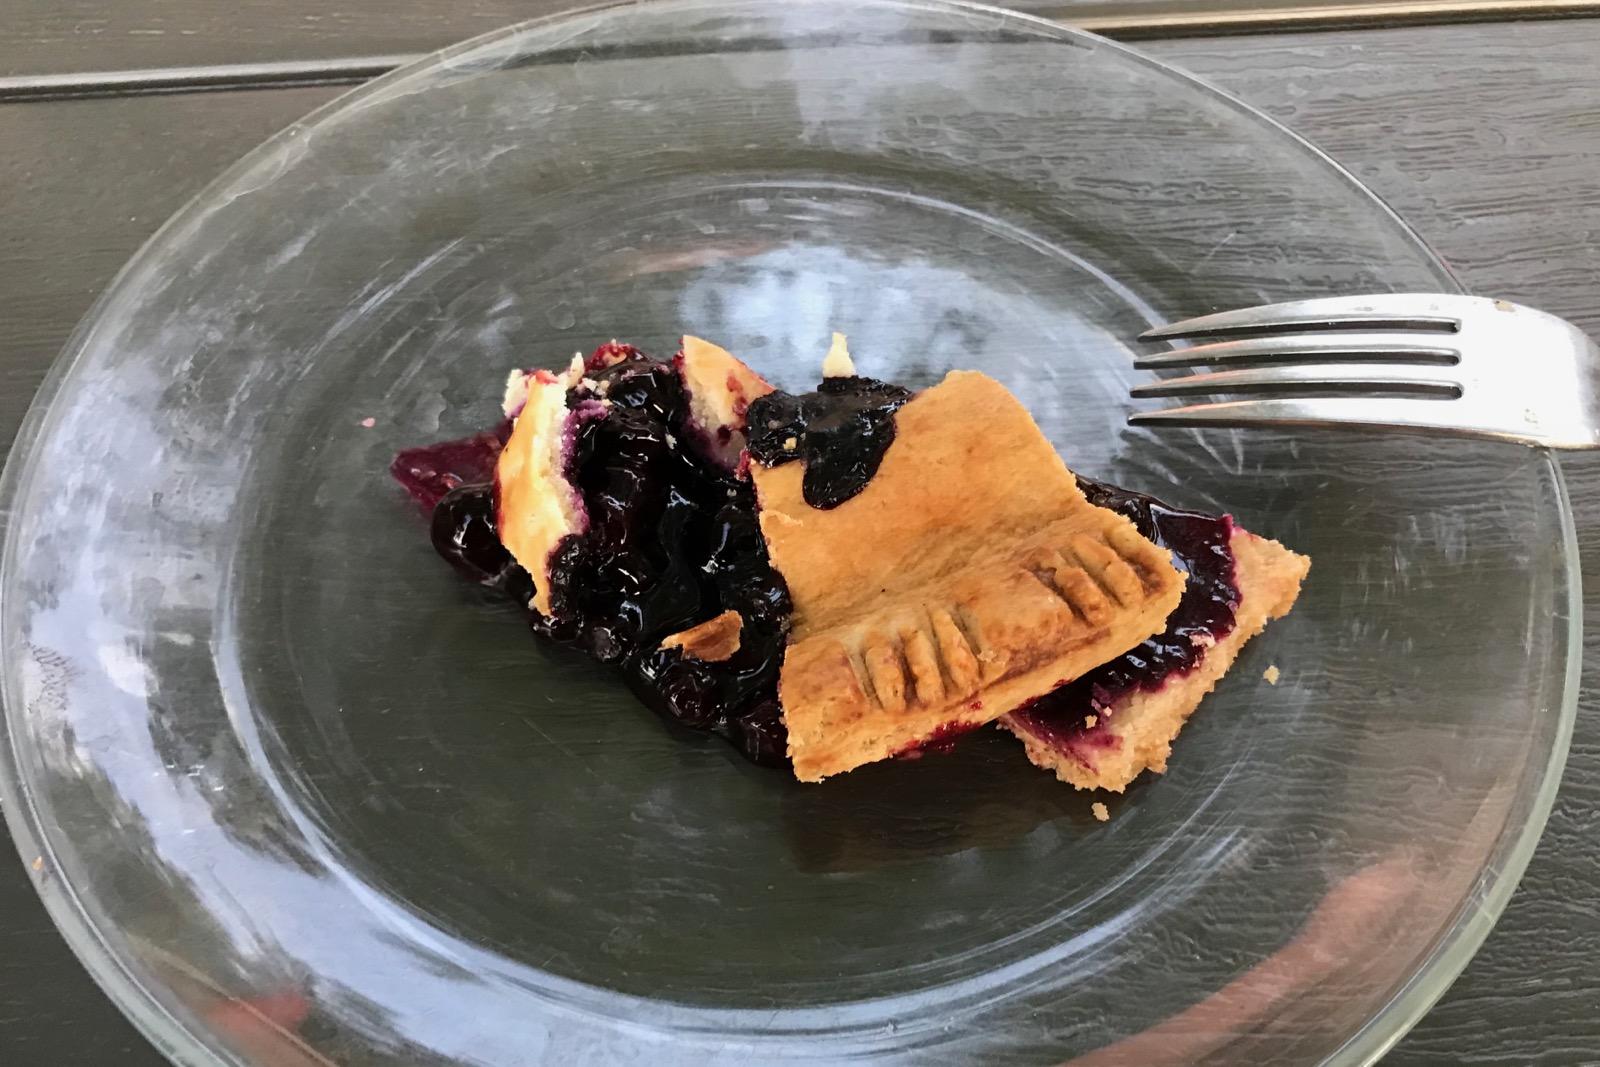 http://blog.rickk.com/food/2018/07/08/ate.2018.07.07.t.jpg